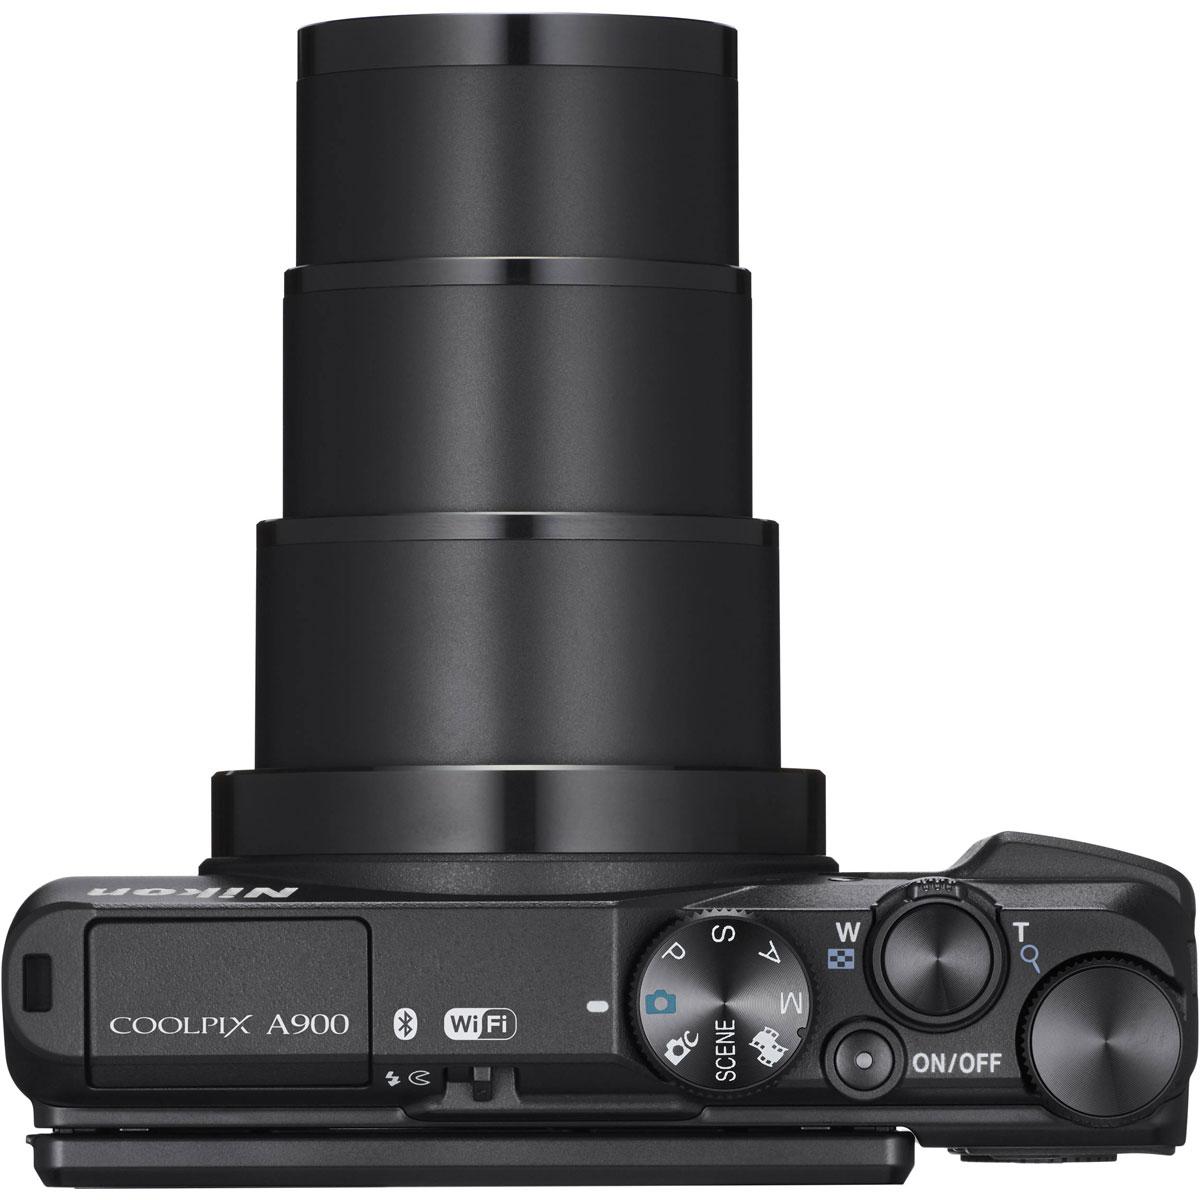 Nikon Coolpix A900, Black цифровая фотокамера